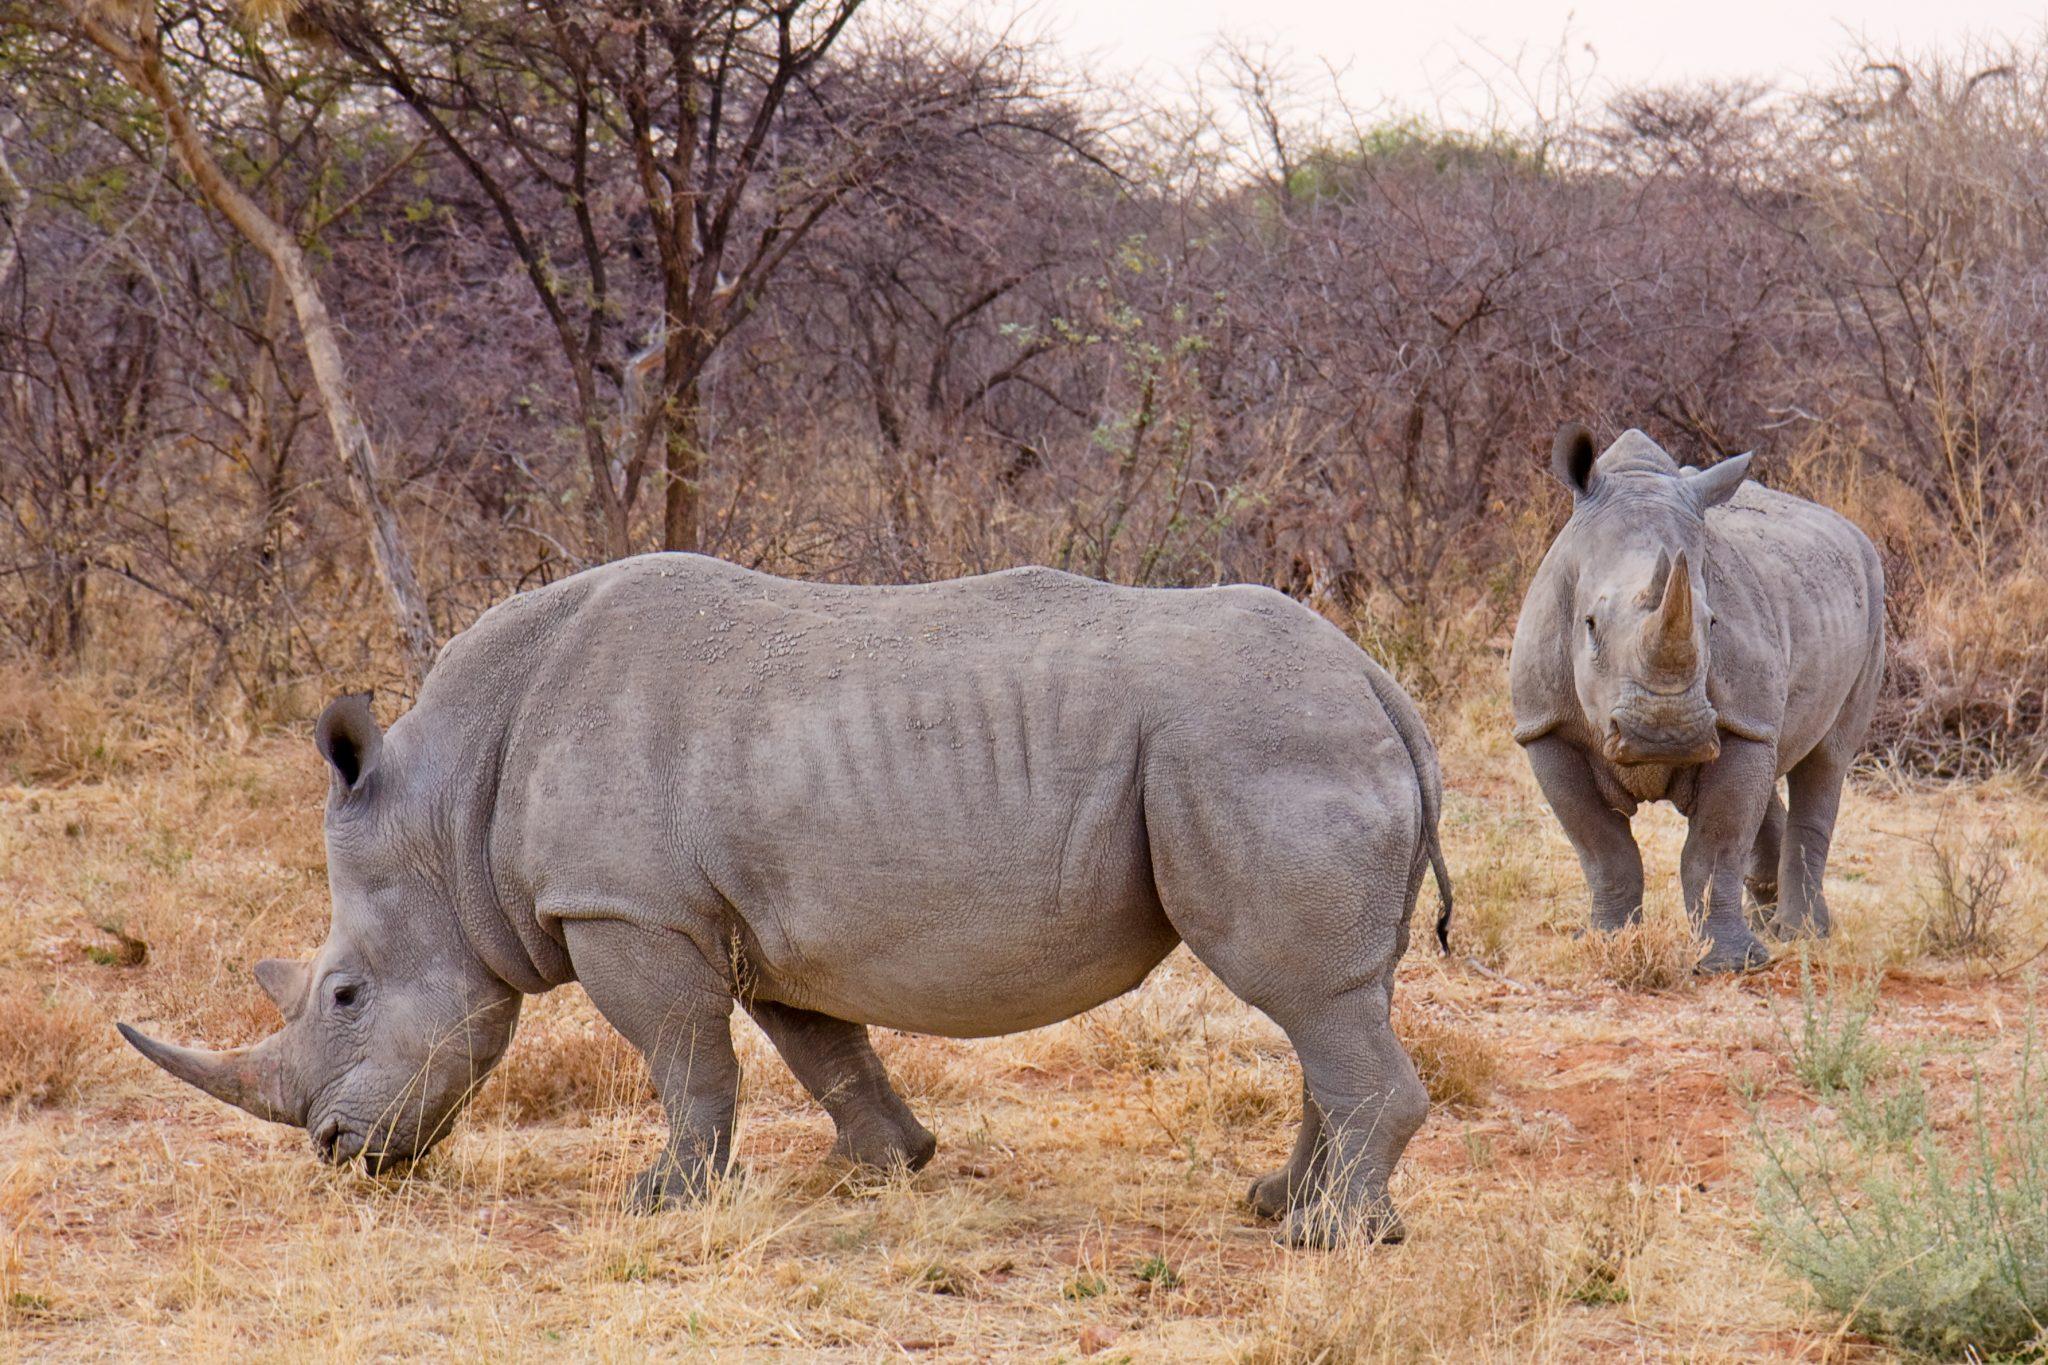 White rhinos in Namibia. Photo by Ikiwaner.